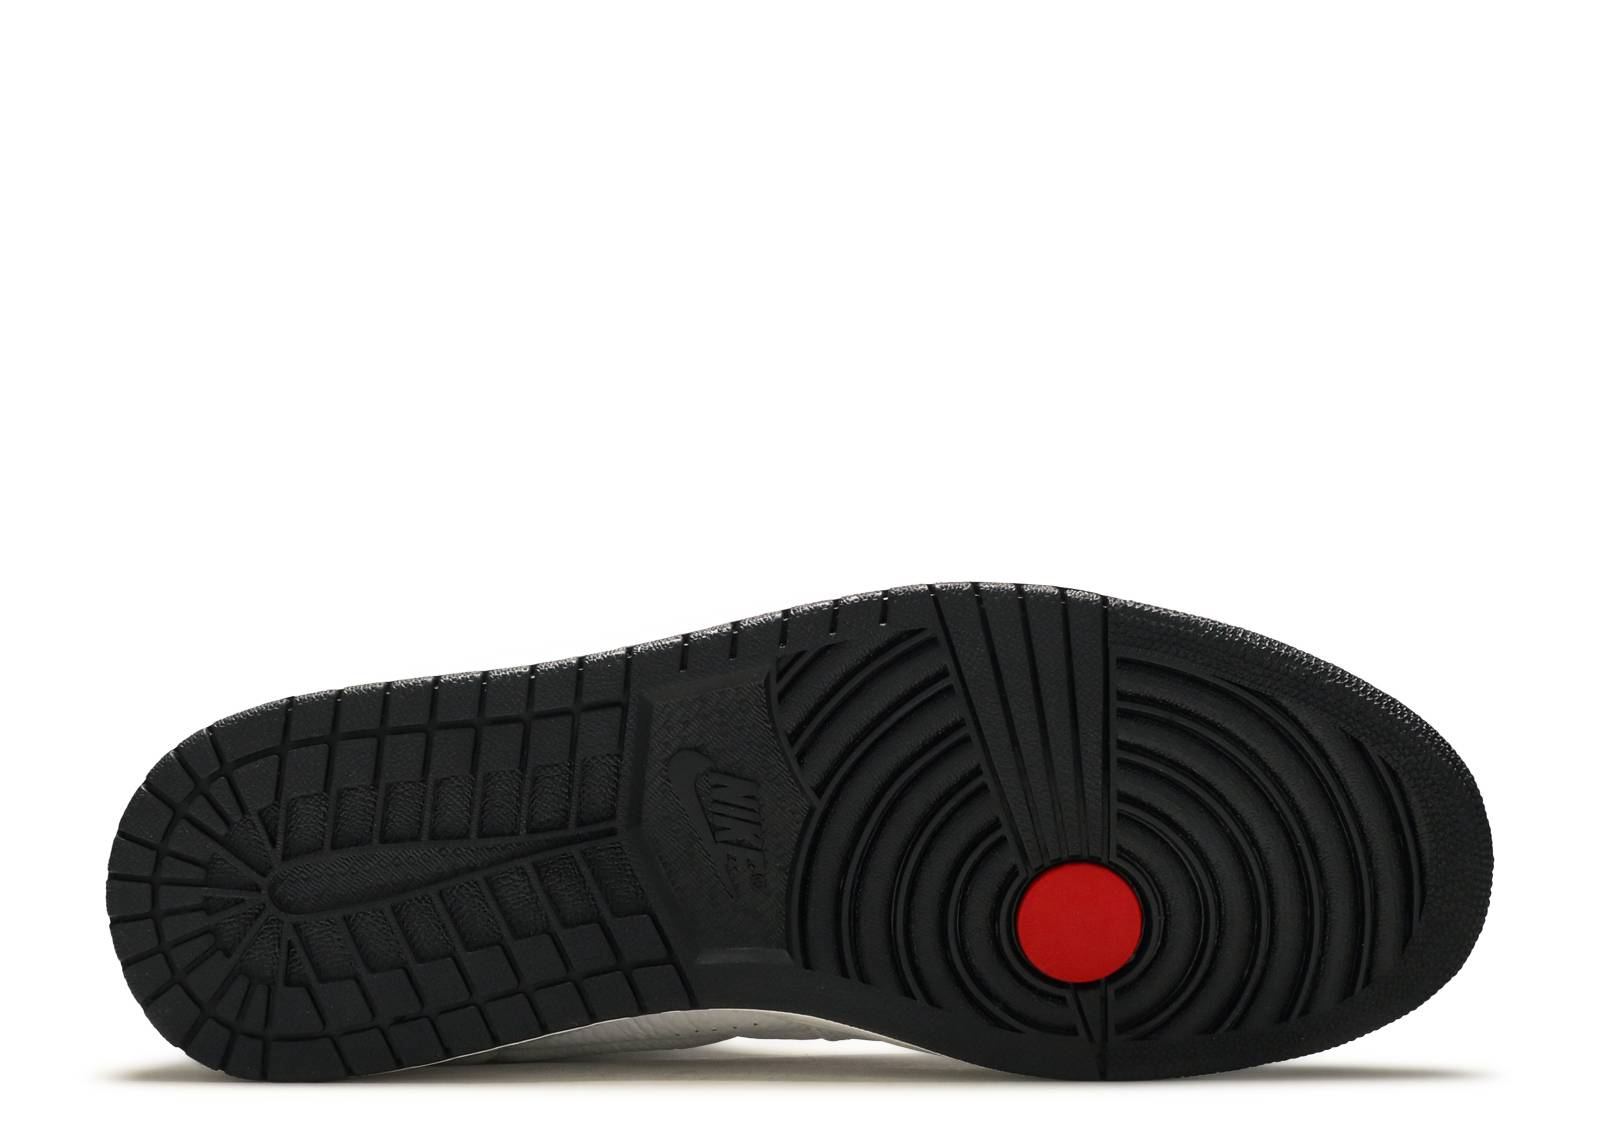 newest 941d7 66337 Air Jordan 1 Retro 99 - Air Jordan - 654140 101 - white black-gym red    Flight Club